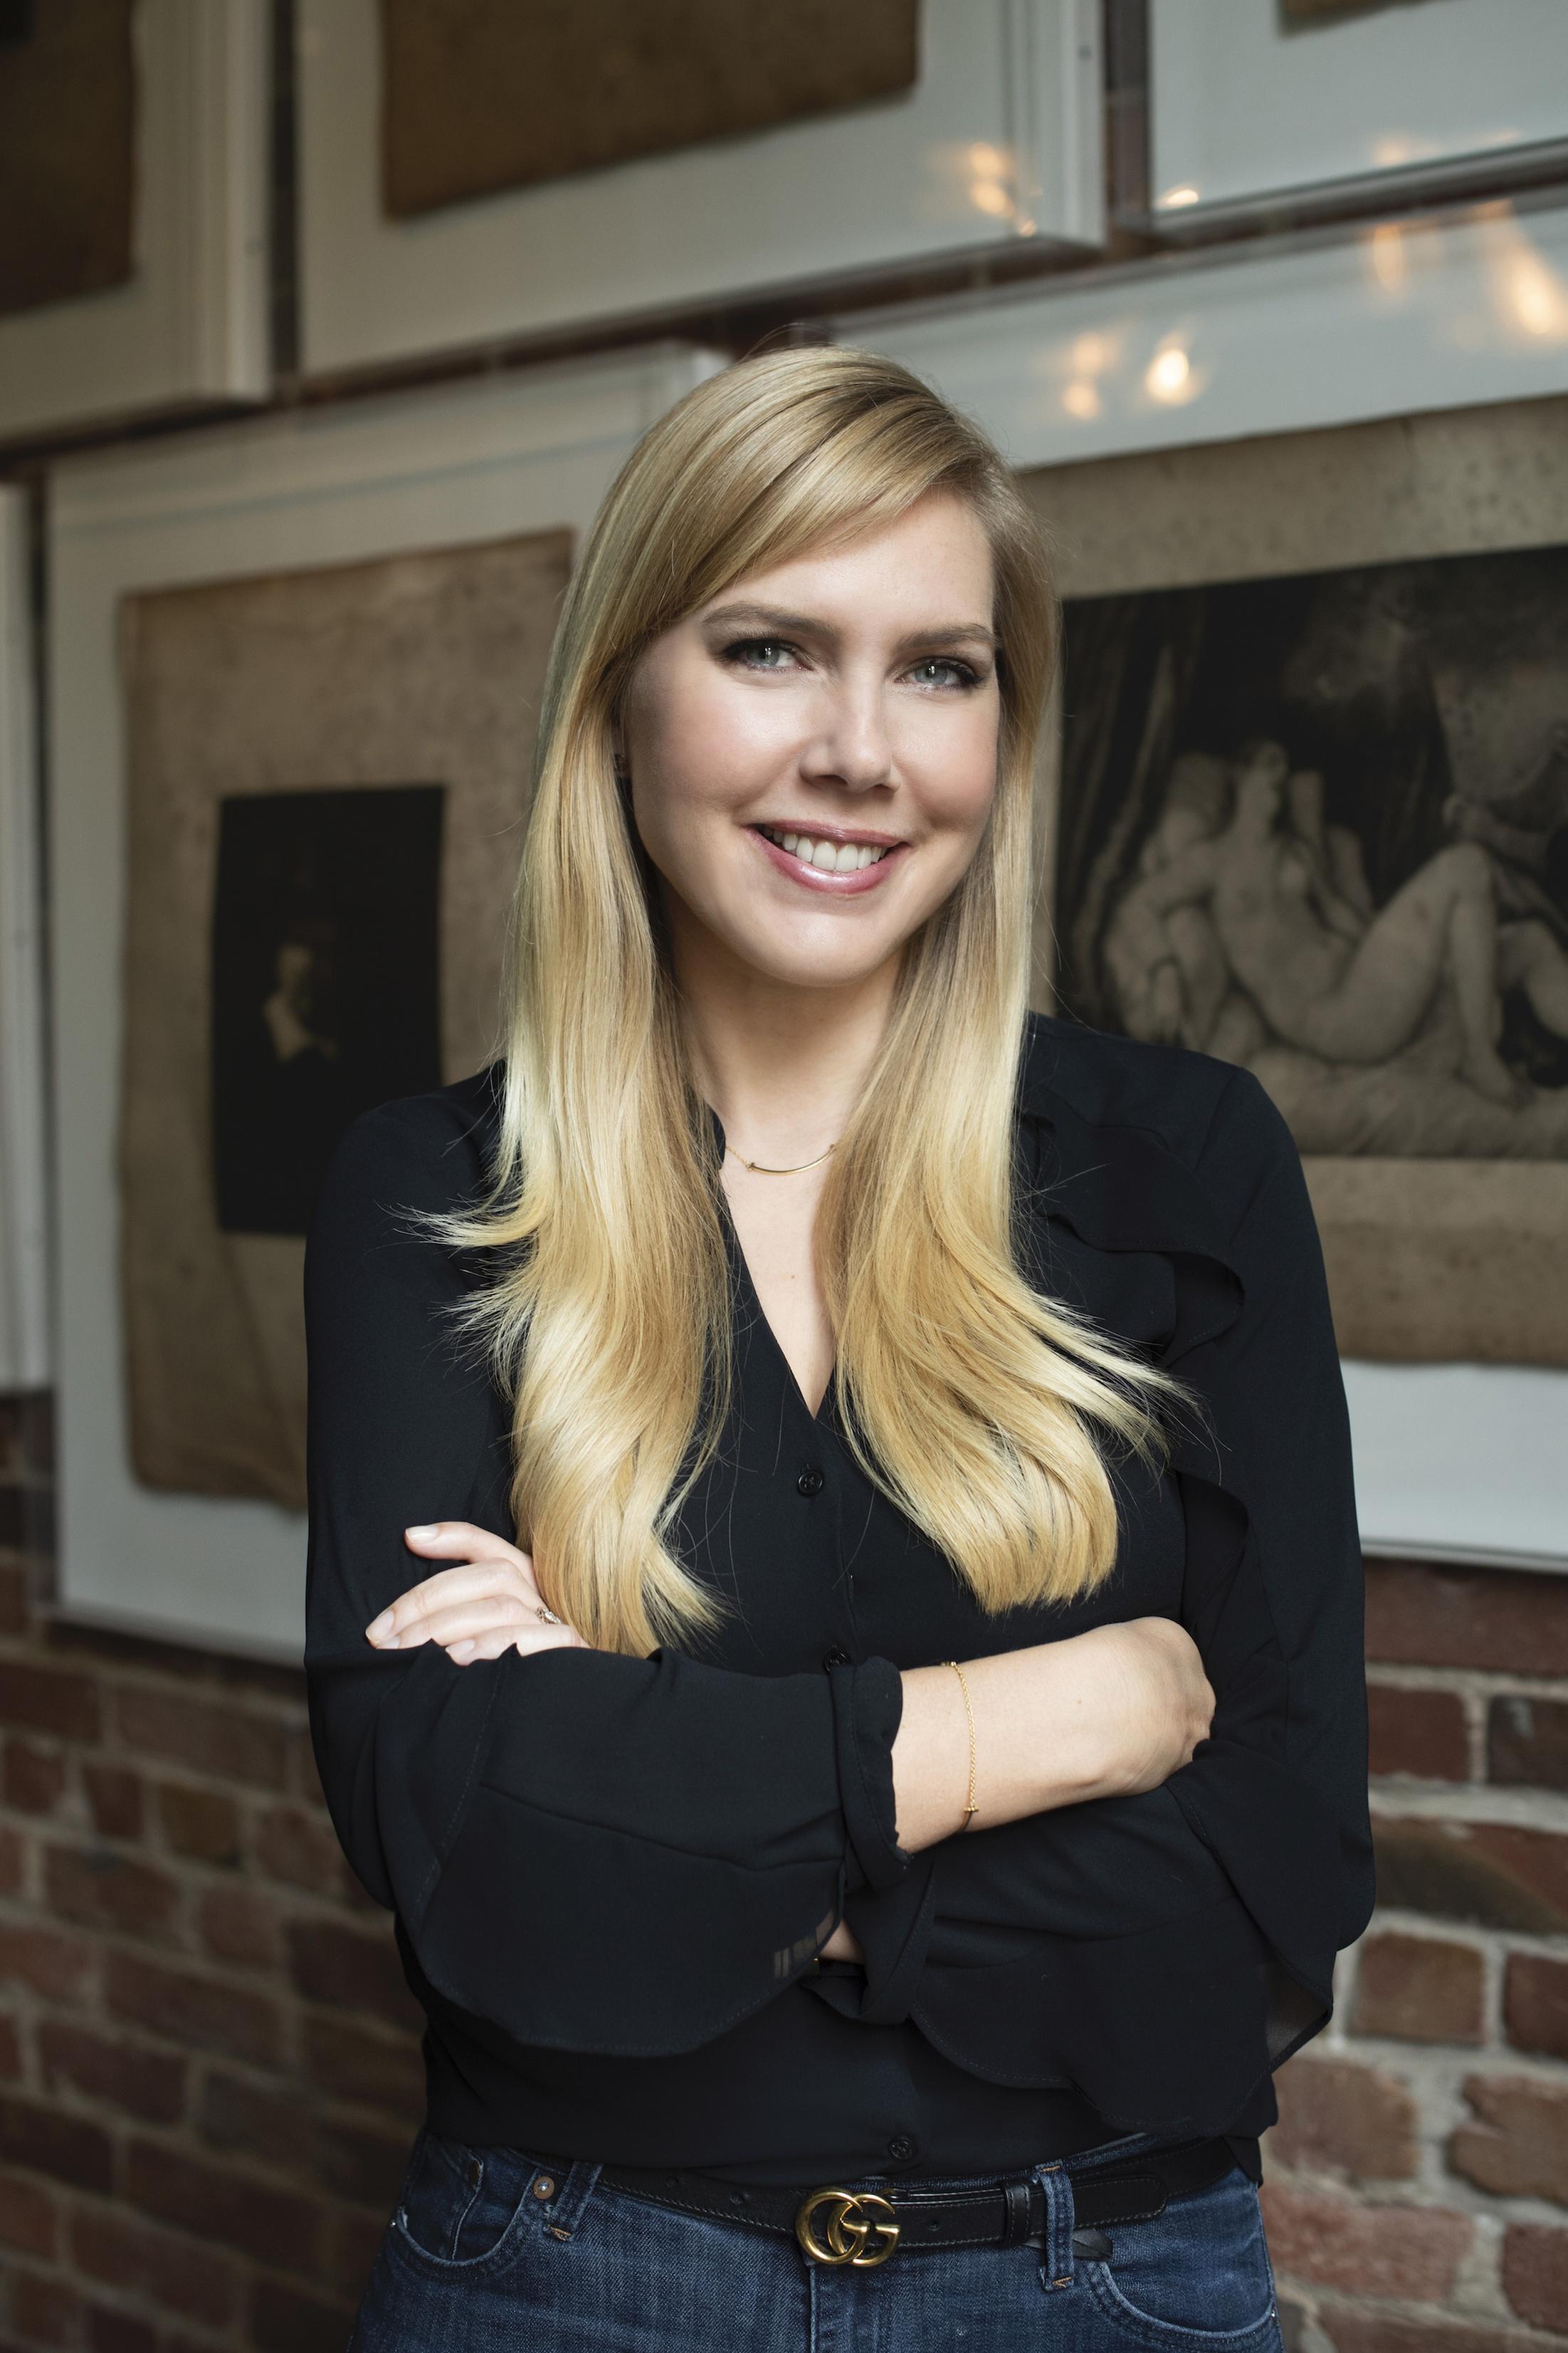 Katelin Holloway dice que trabajar con obras de Ohanian